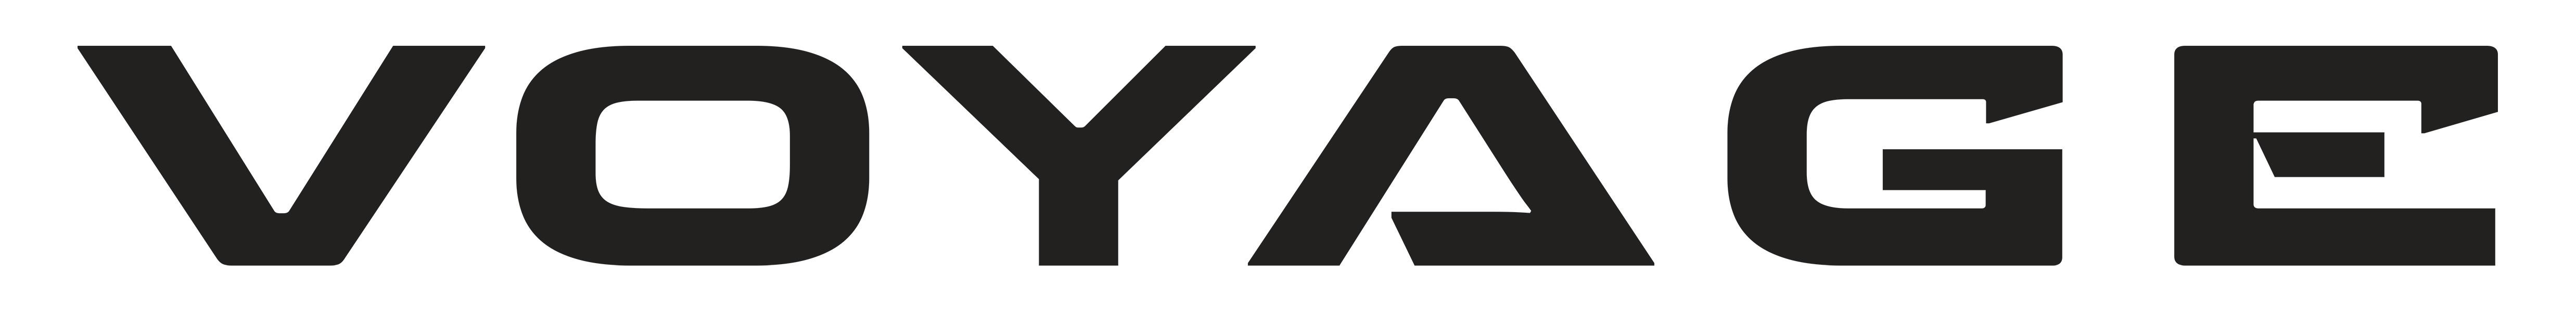 Voyage Travel Trailer Logo